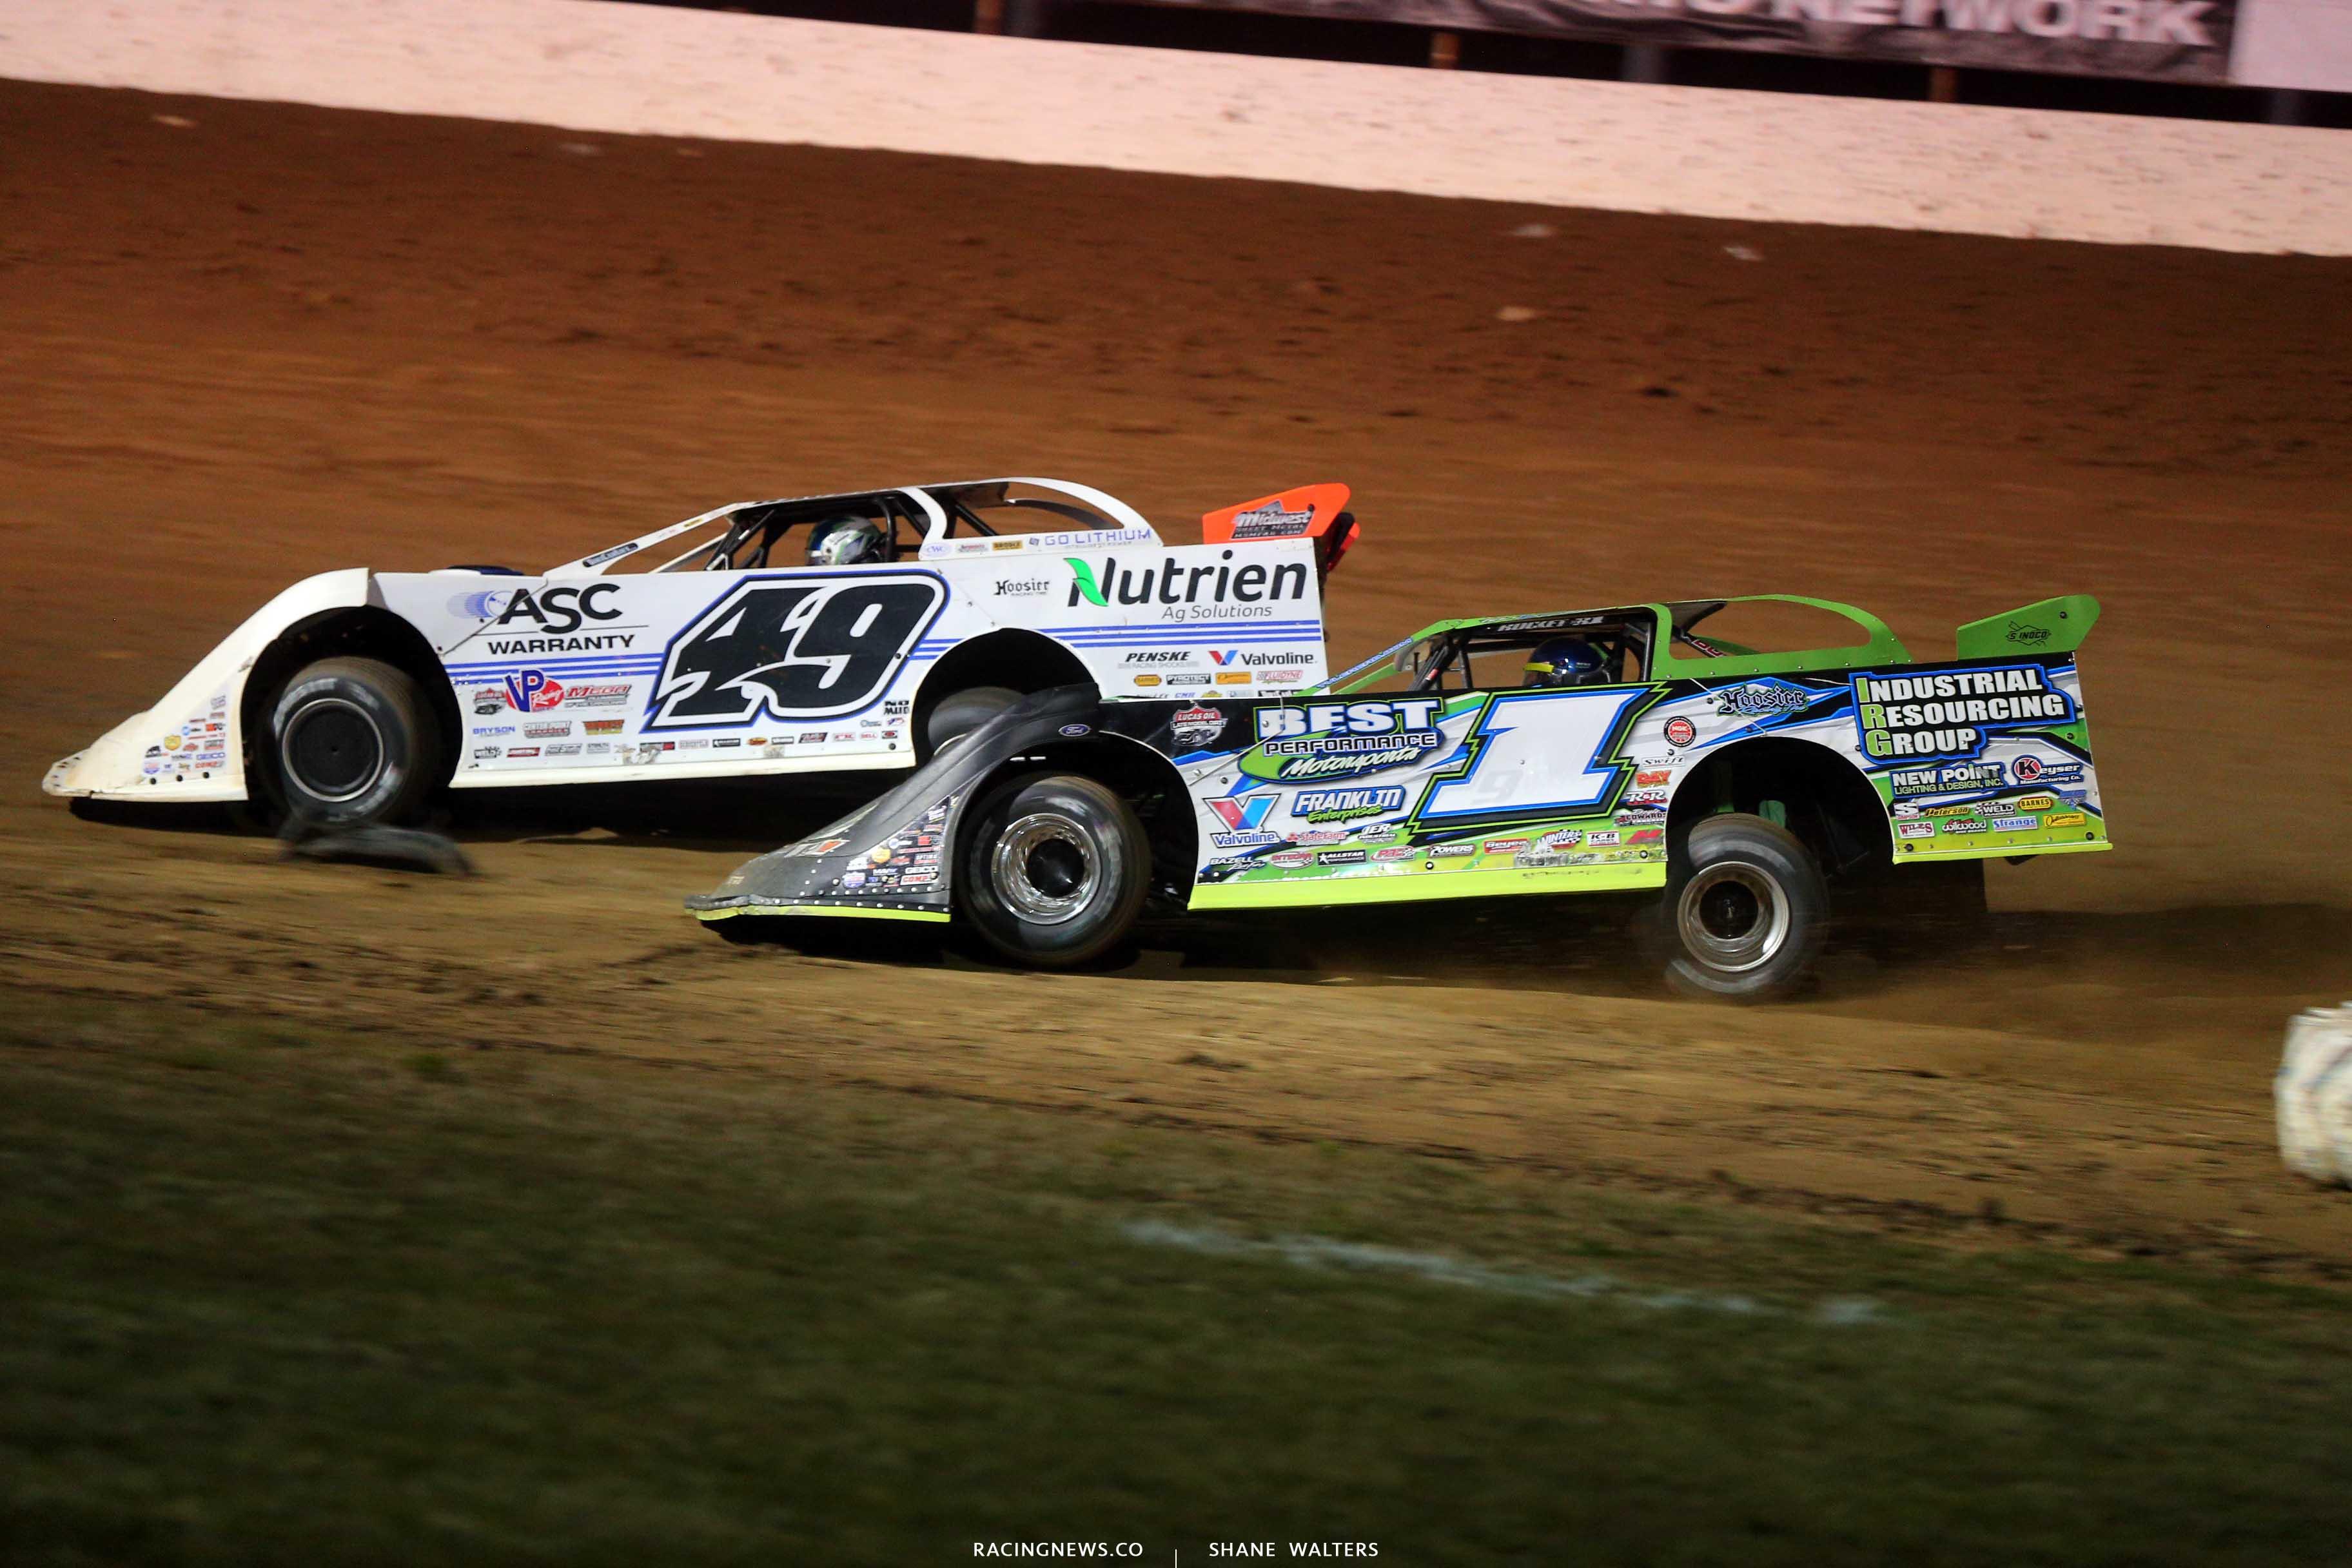 DTWC Lineups: October 19, 2019 (Lucas Oil Late Model Dirt Series) - Racing News